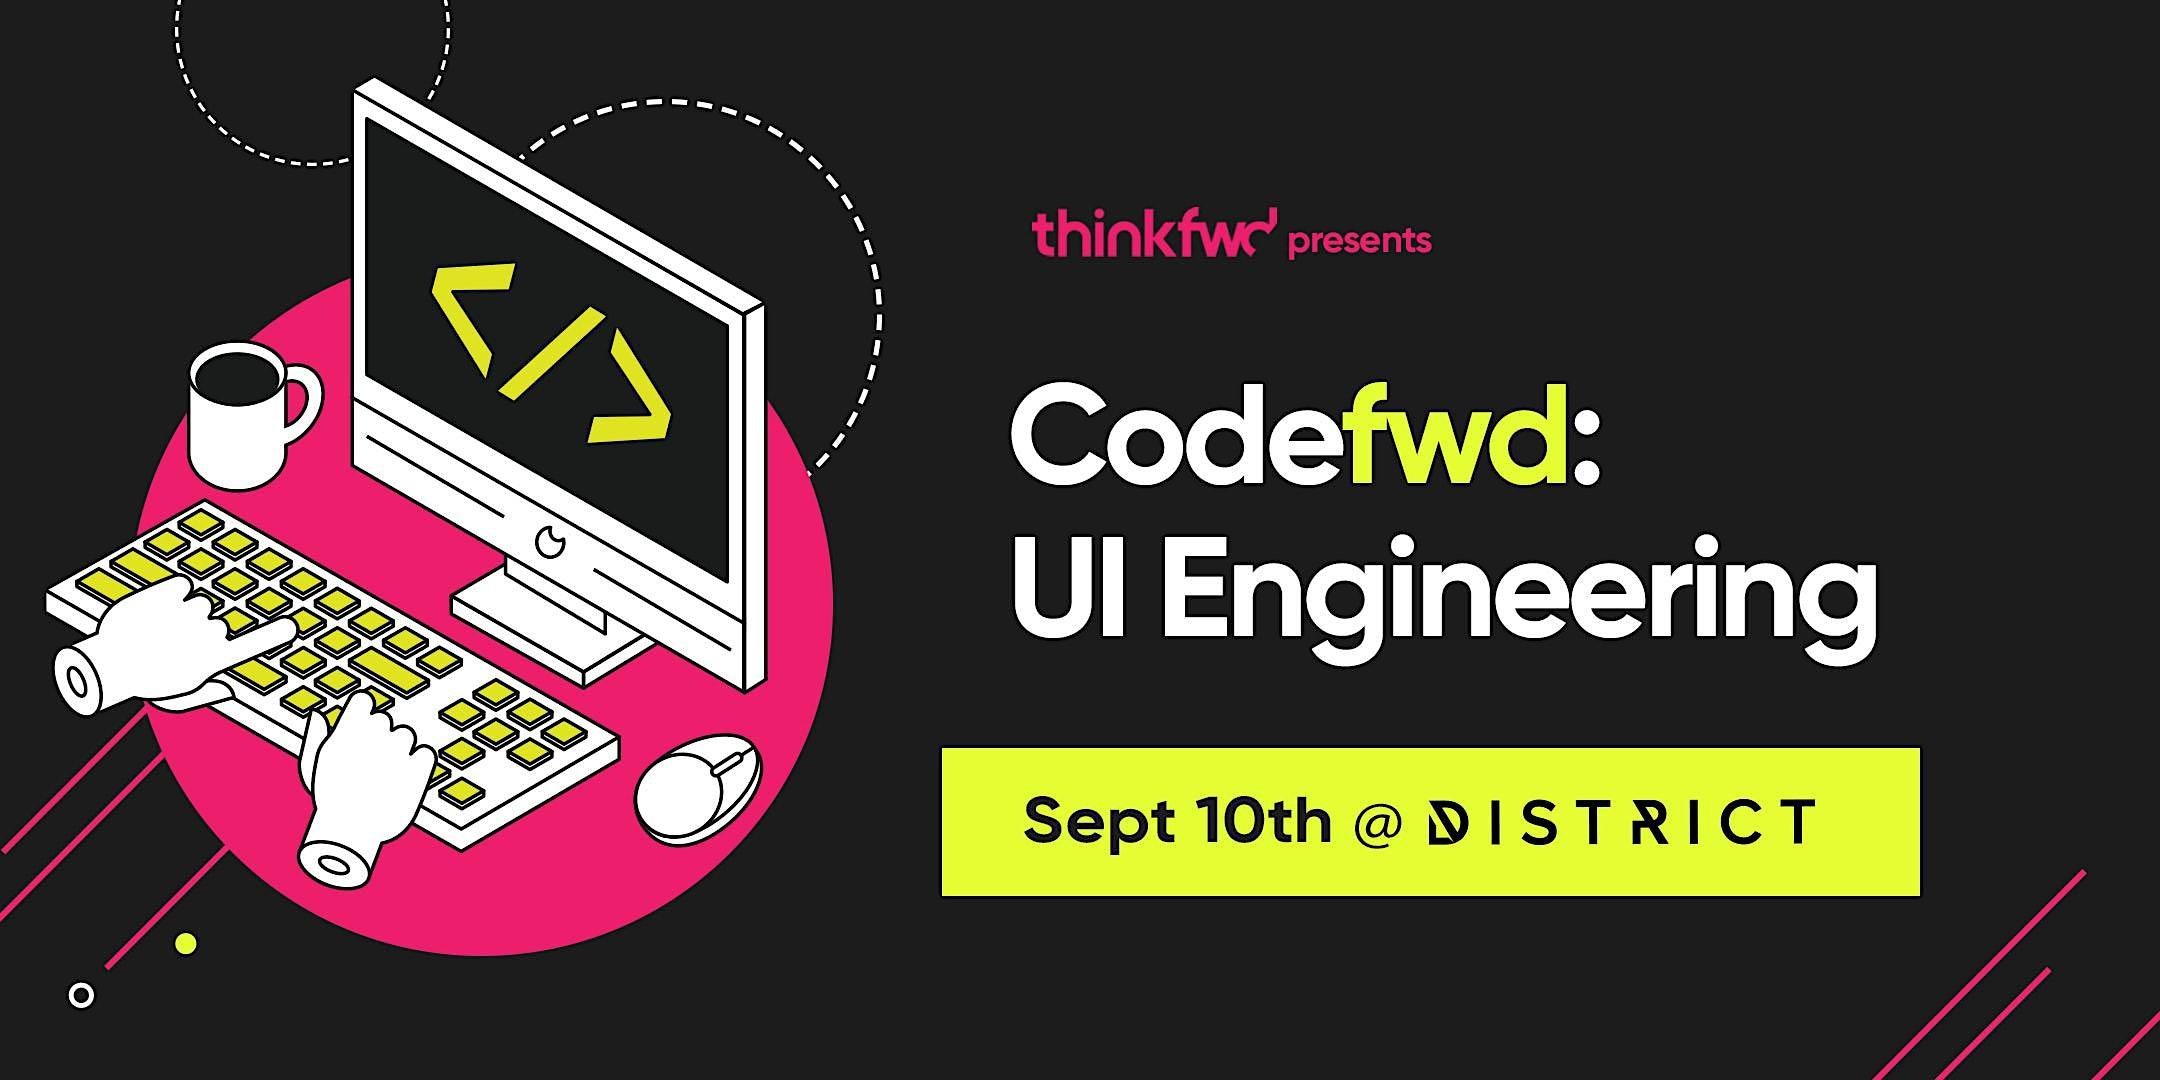 Code:fwd - UI Engineering